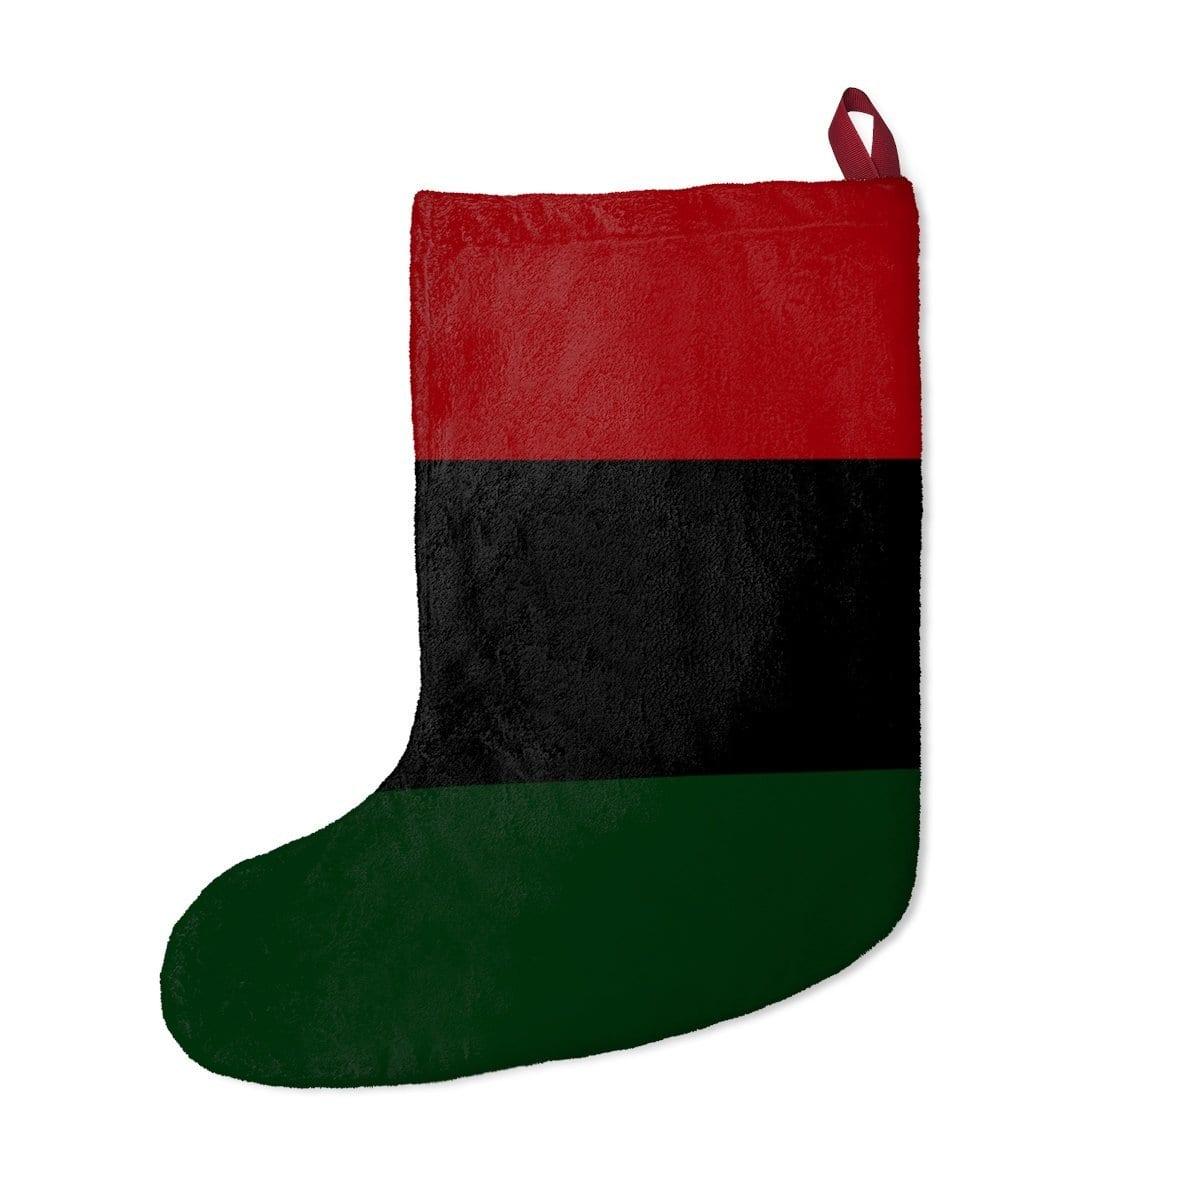 RBG Christmas Stockings - Melanin Apparel